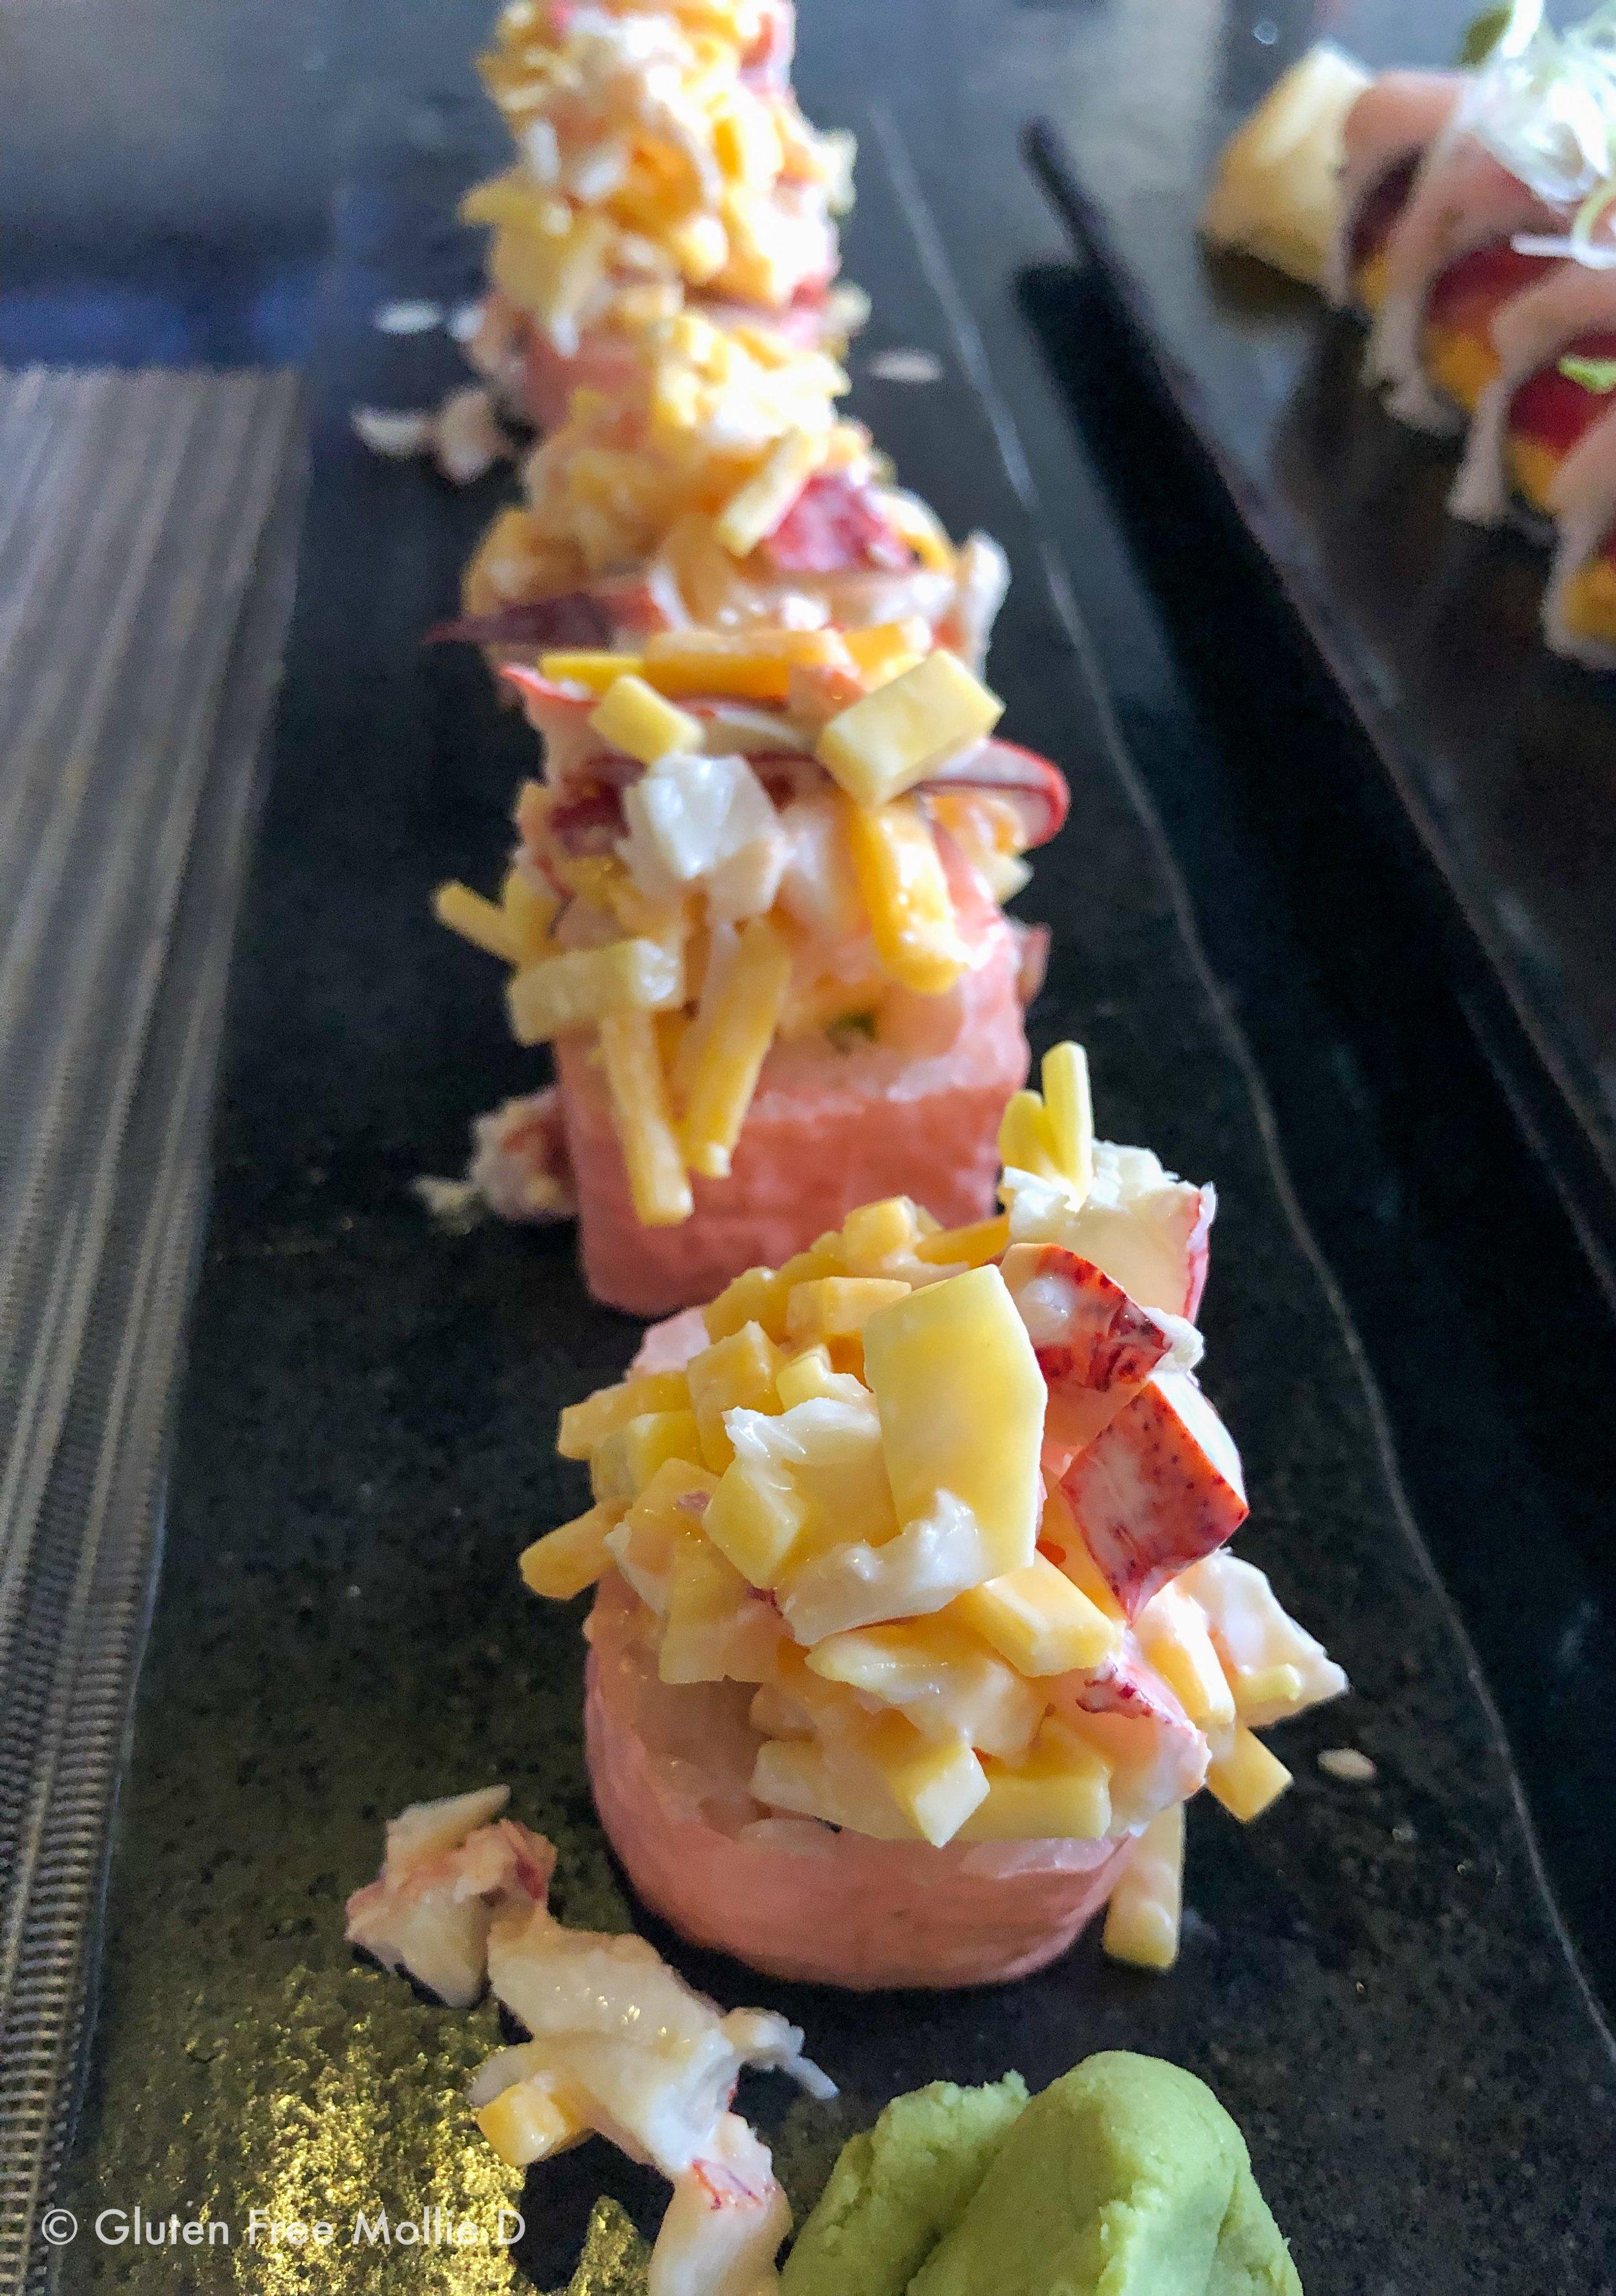 Mmm, sushi...